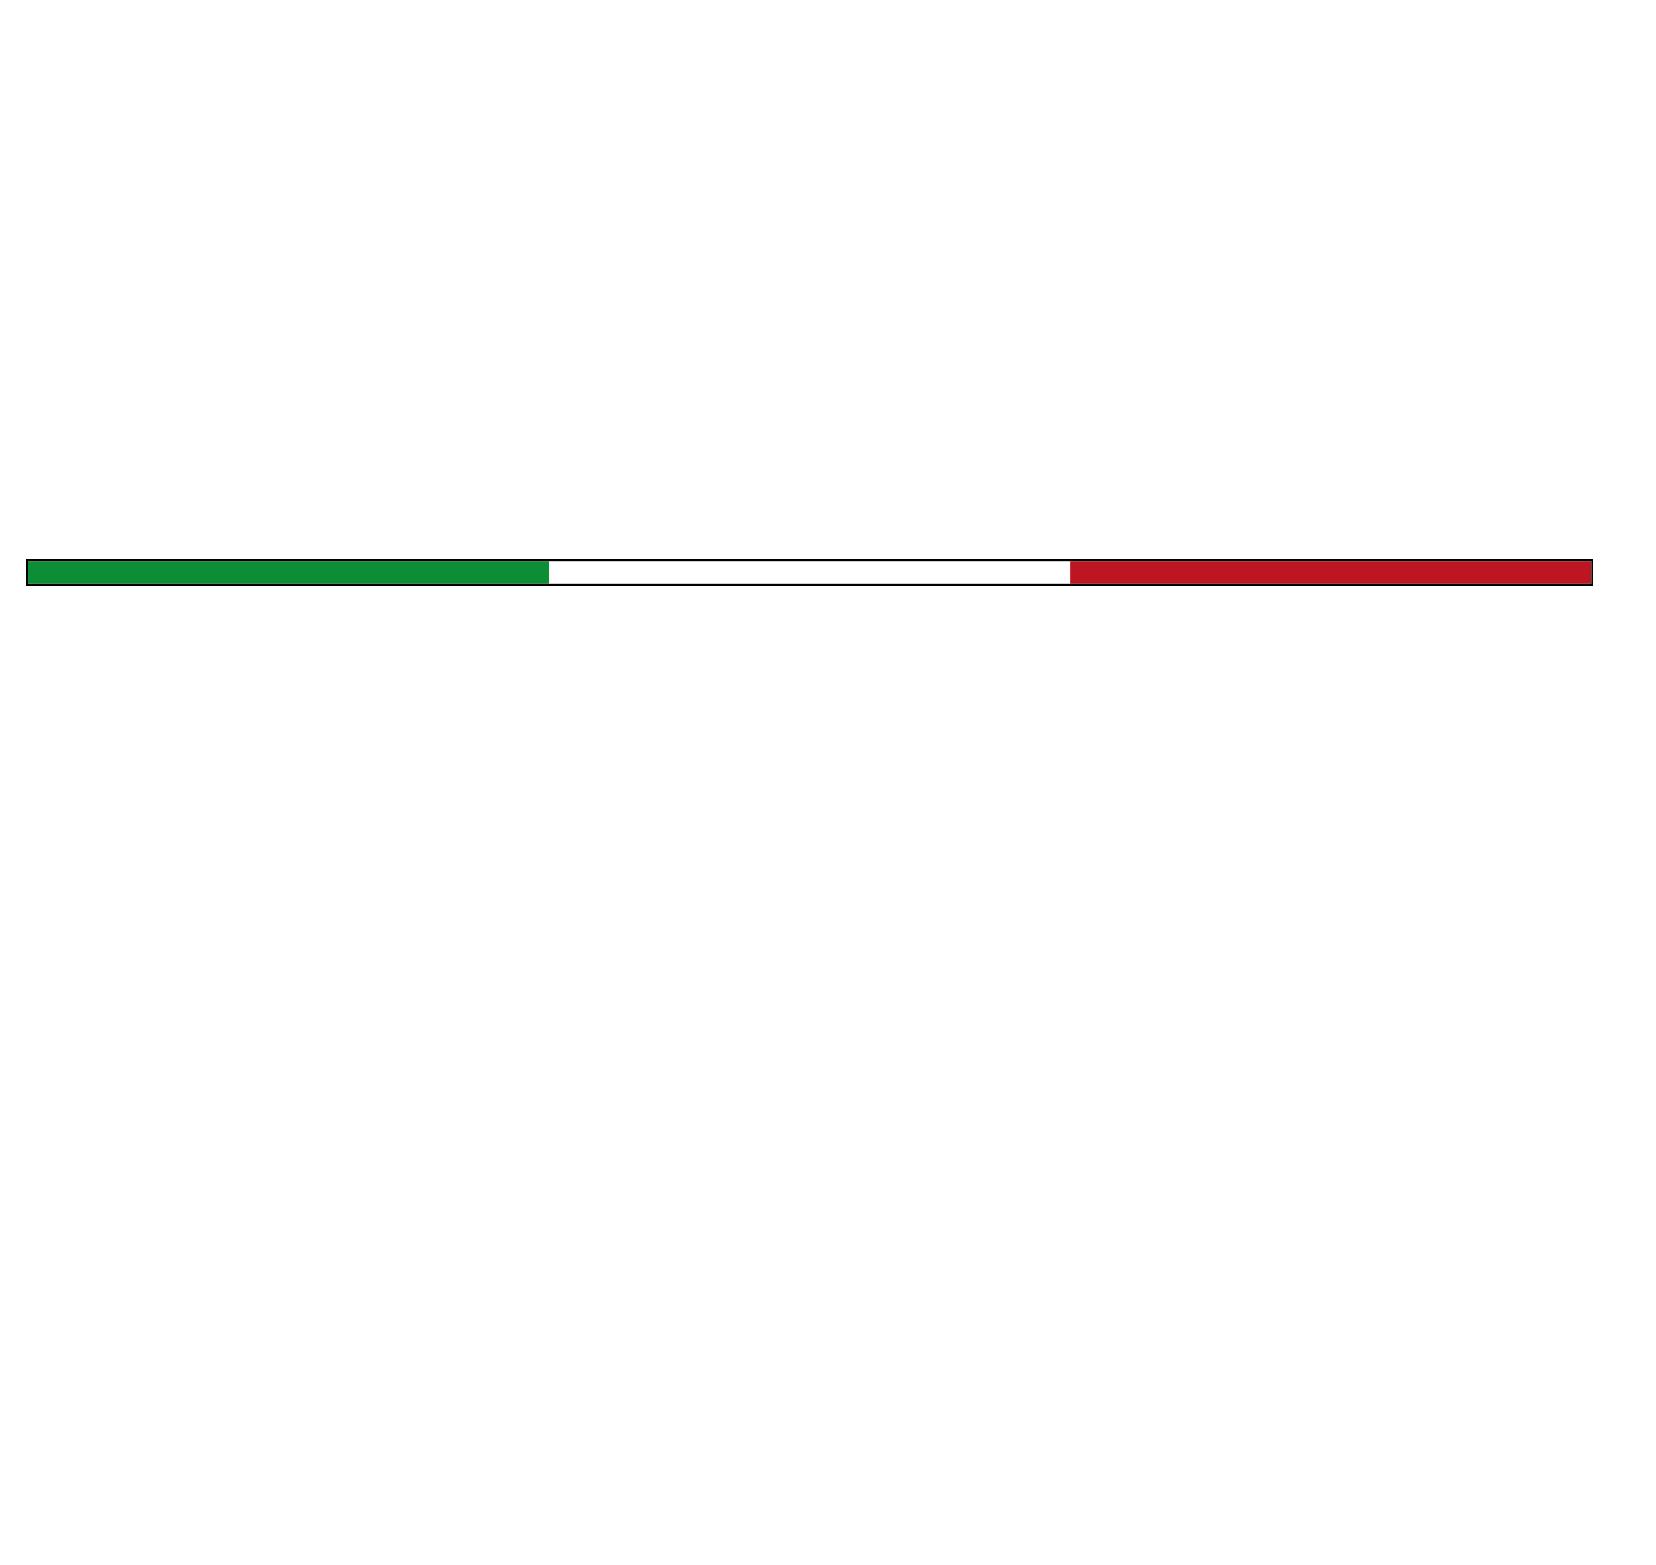 Plyform Composites Srl